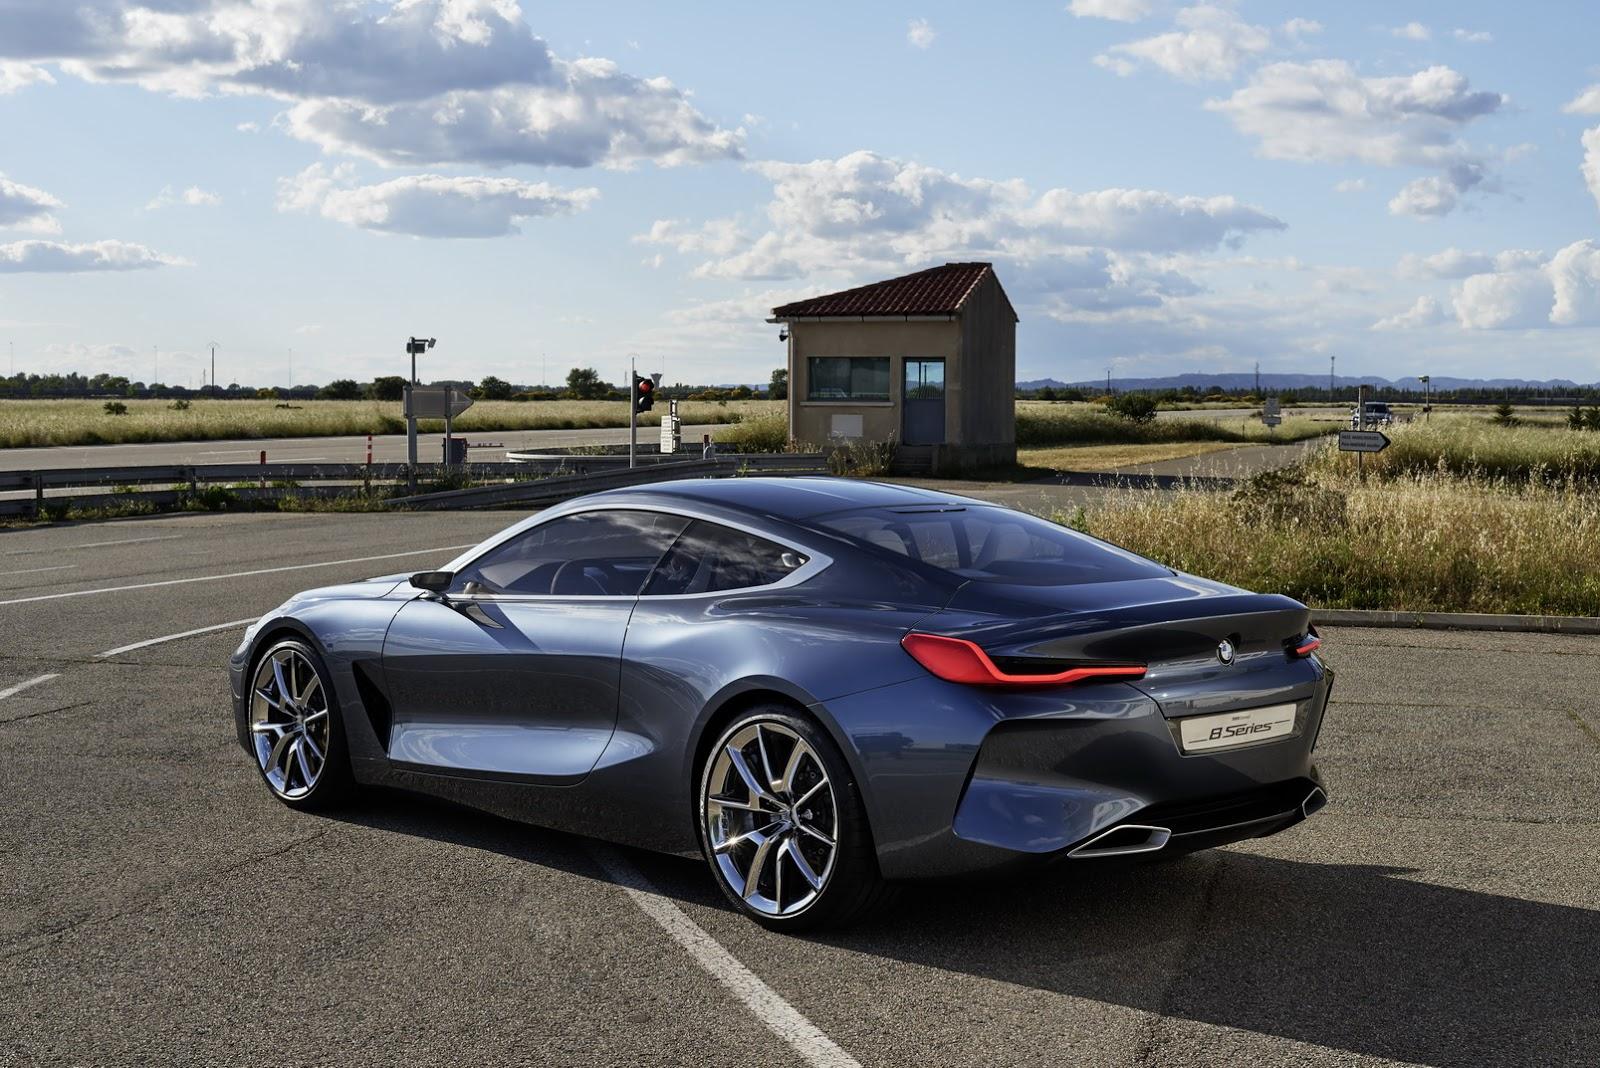 BMW_Concept_8_Series_37